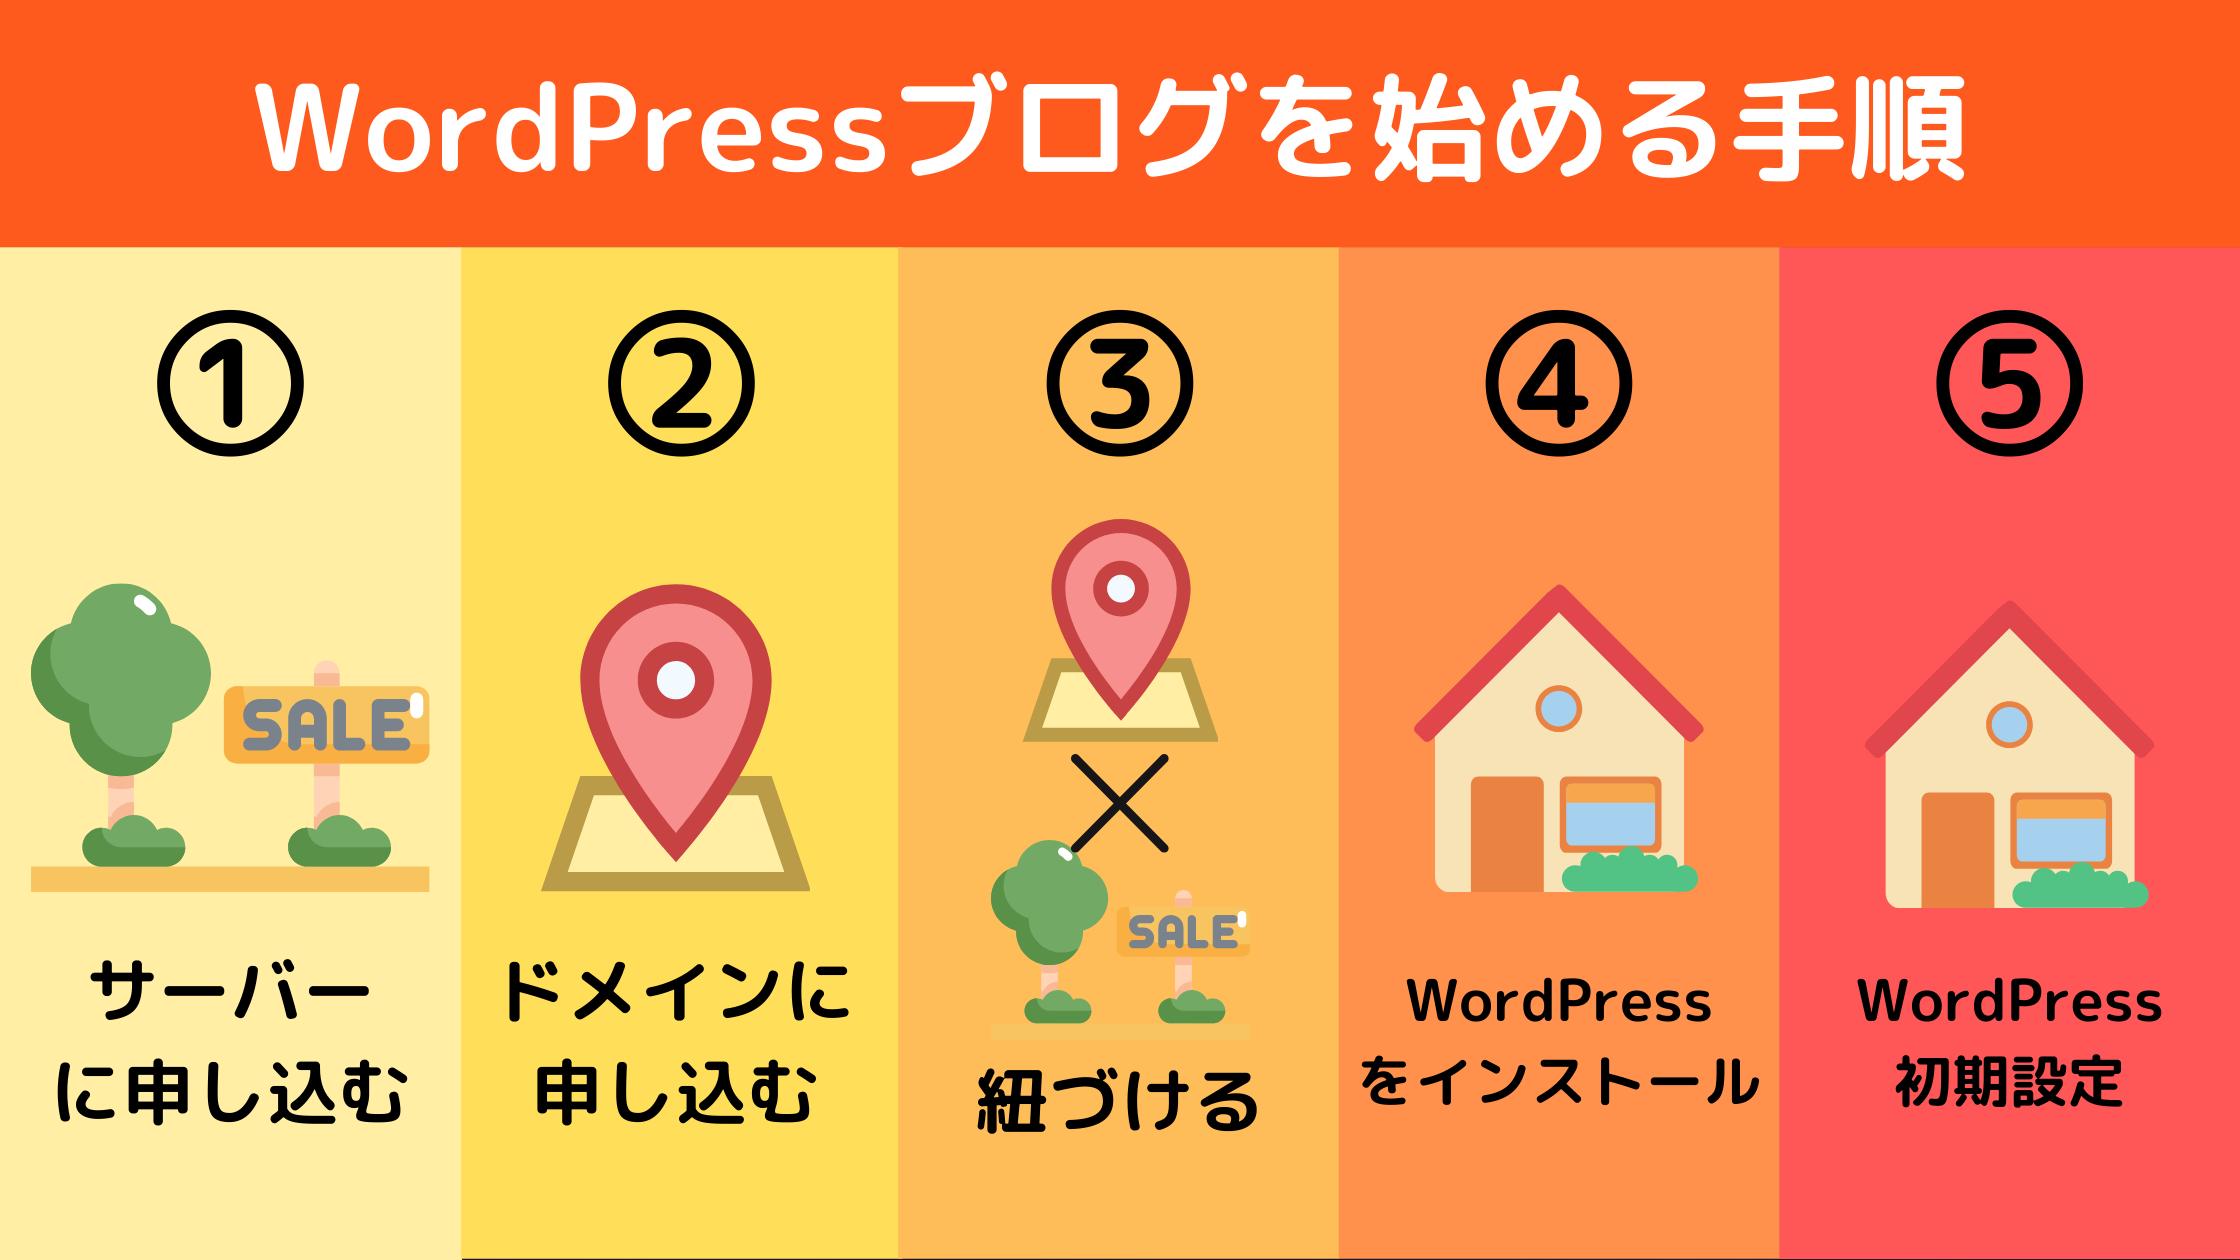 WordPressをブログを始める手順